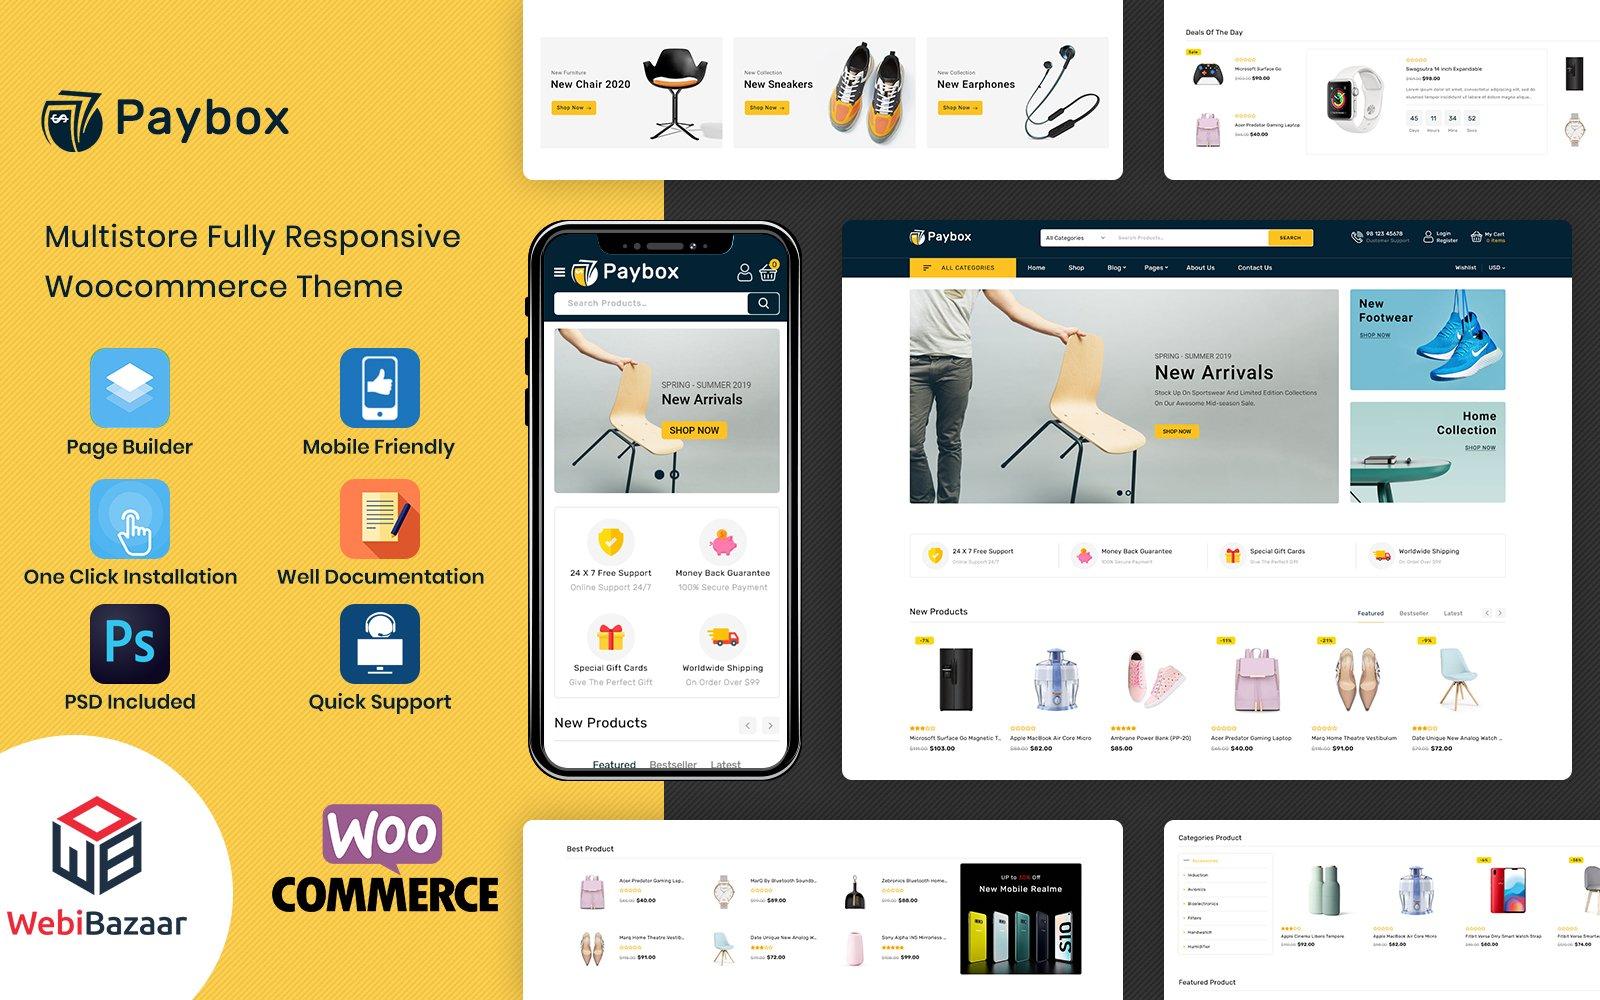 PayBox - Multipurpose Super Market WooCommerce Theme